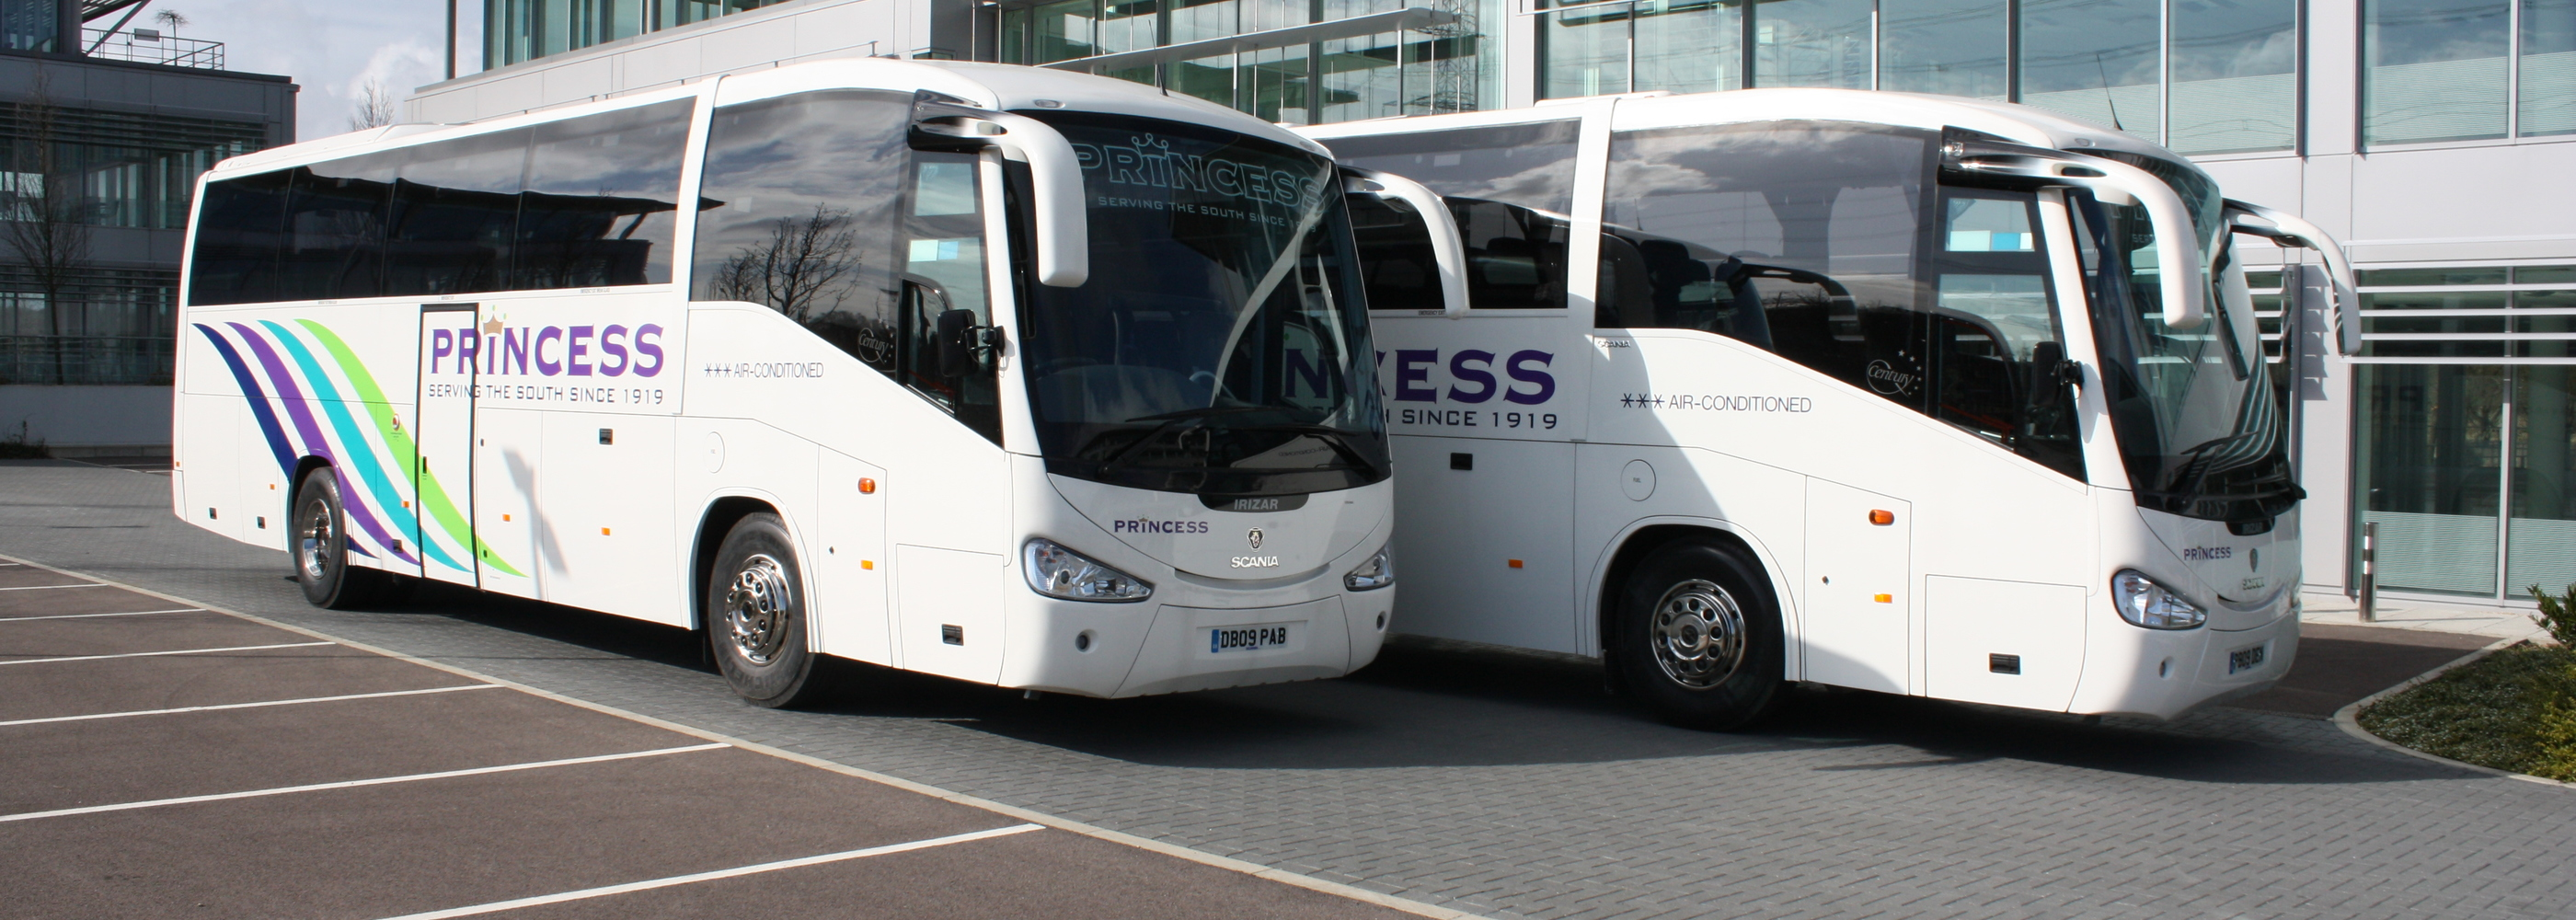 Southampton Scania Irizar Wiring Diagram Princess Coaches Cover